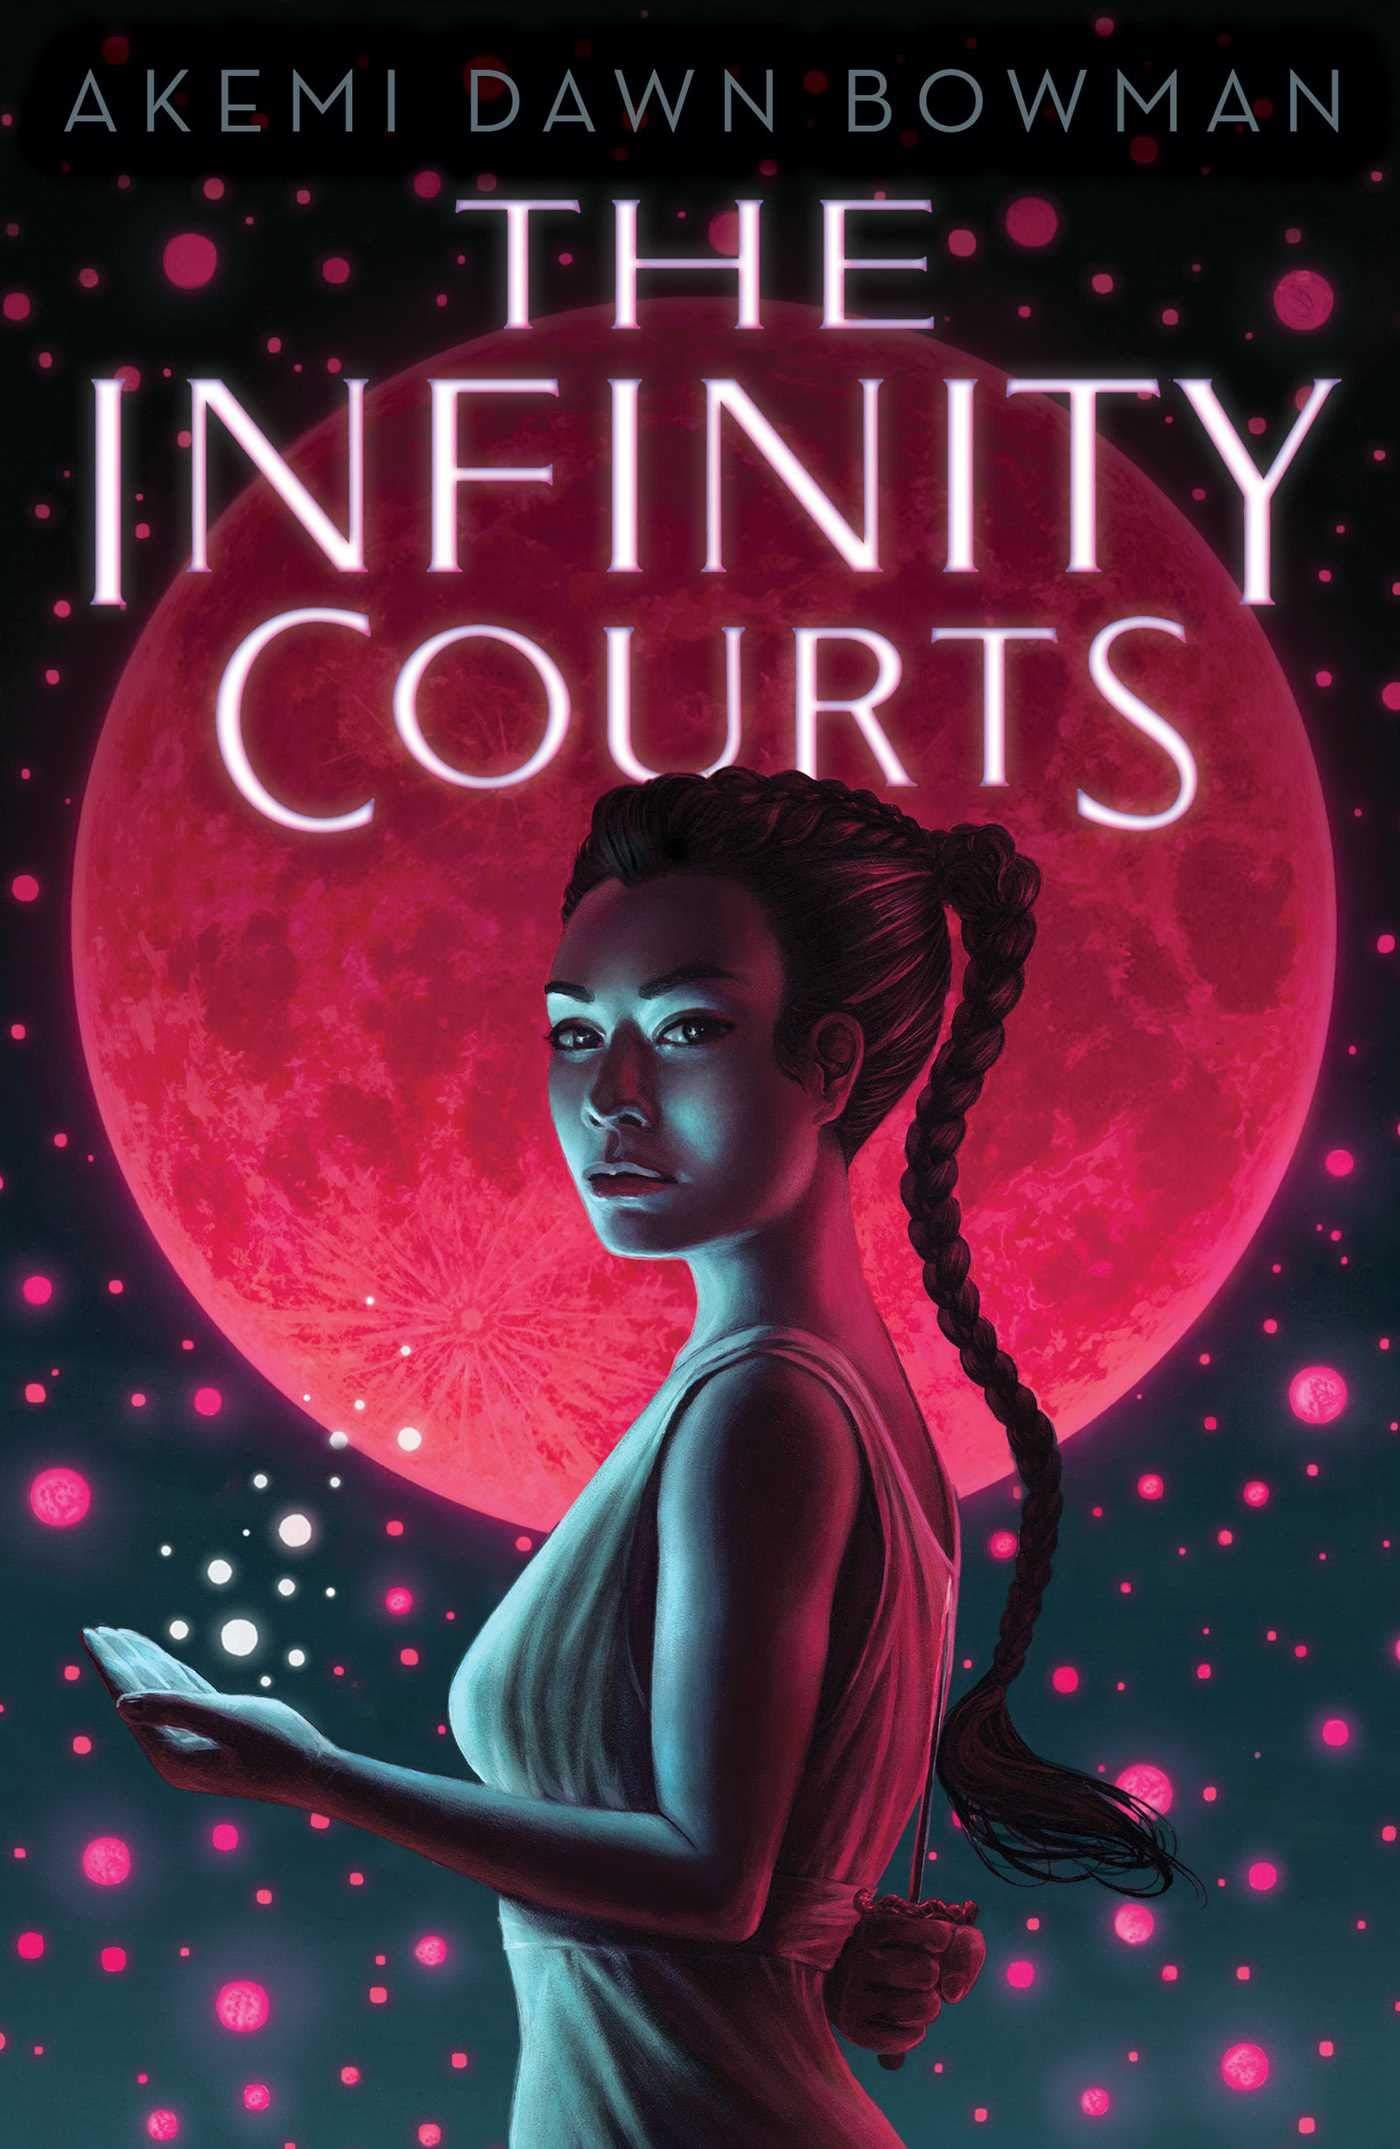 Amazon.com: The Infinity Courts (9781534456495): Bowman, Akemi Dawn: Books